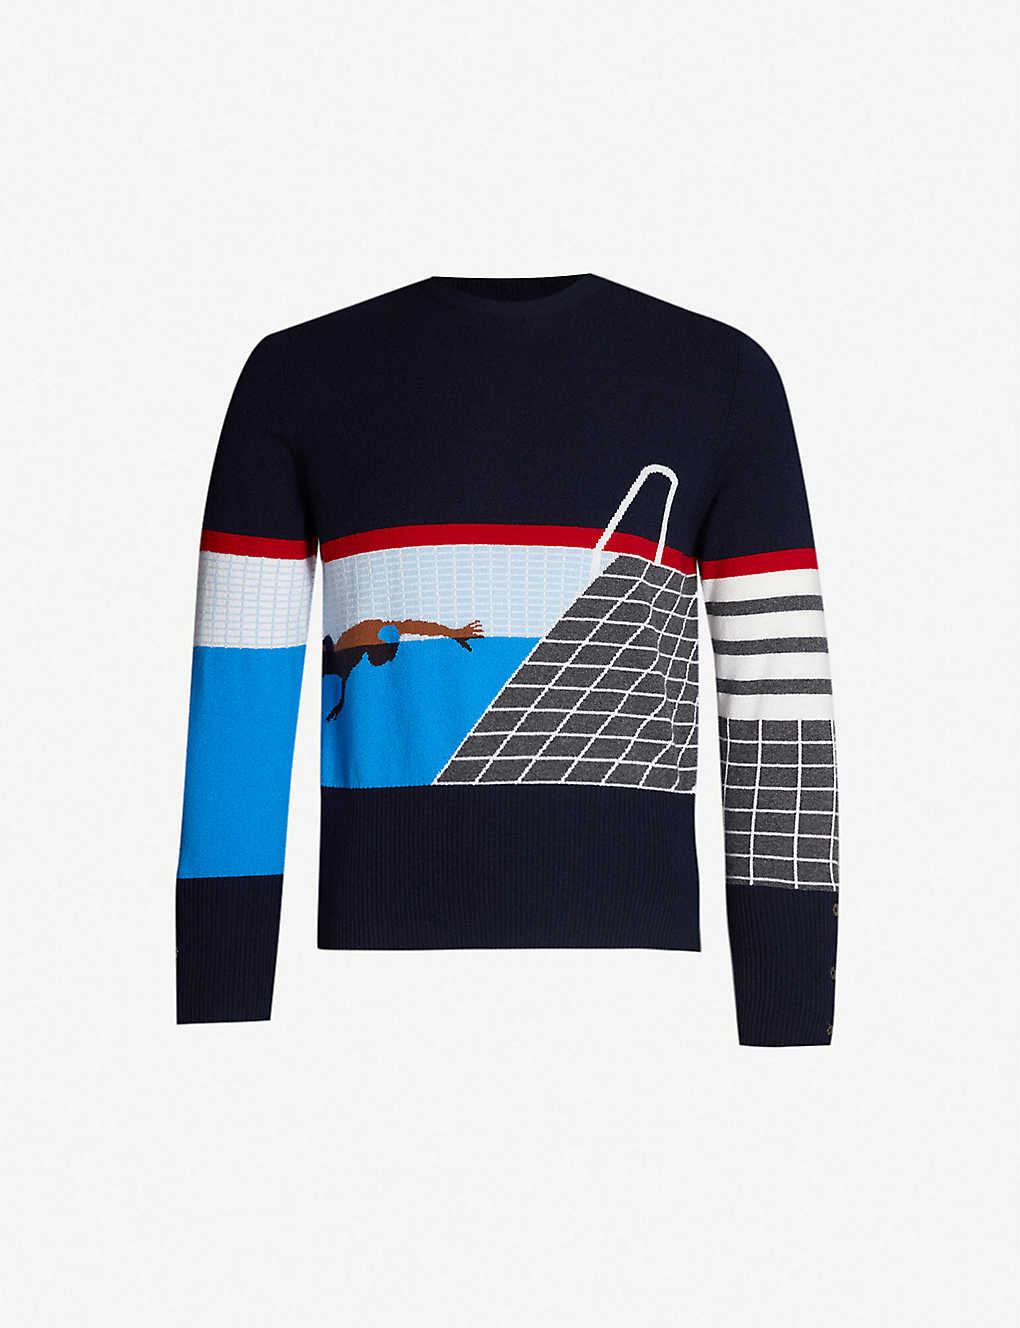 8af74b8e7c THOM BROWNE - Swim cashmere jumper | Selfridges.com